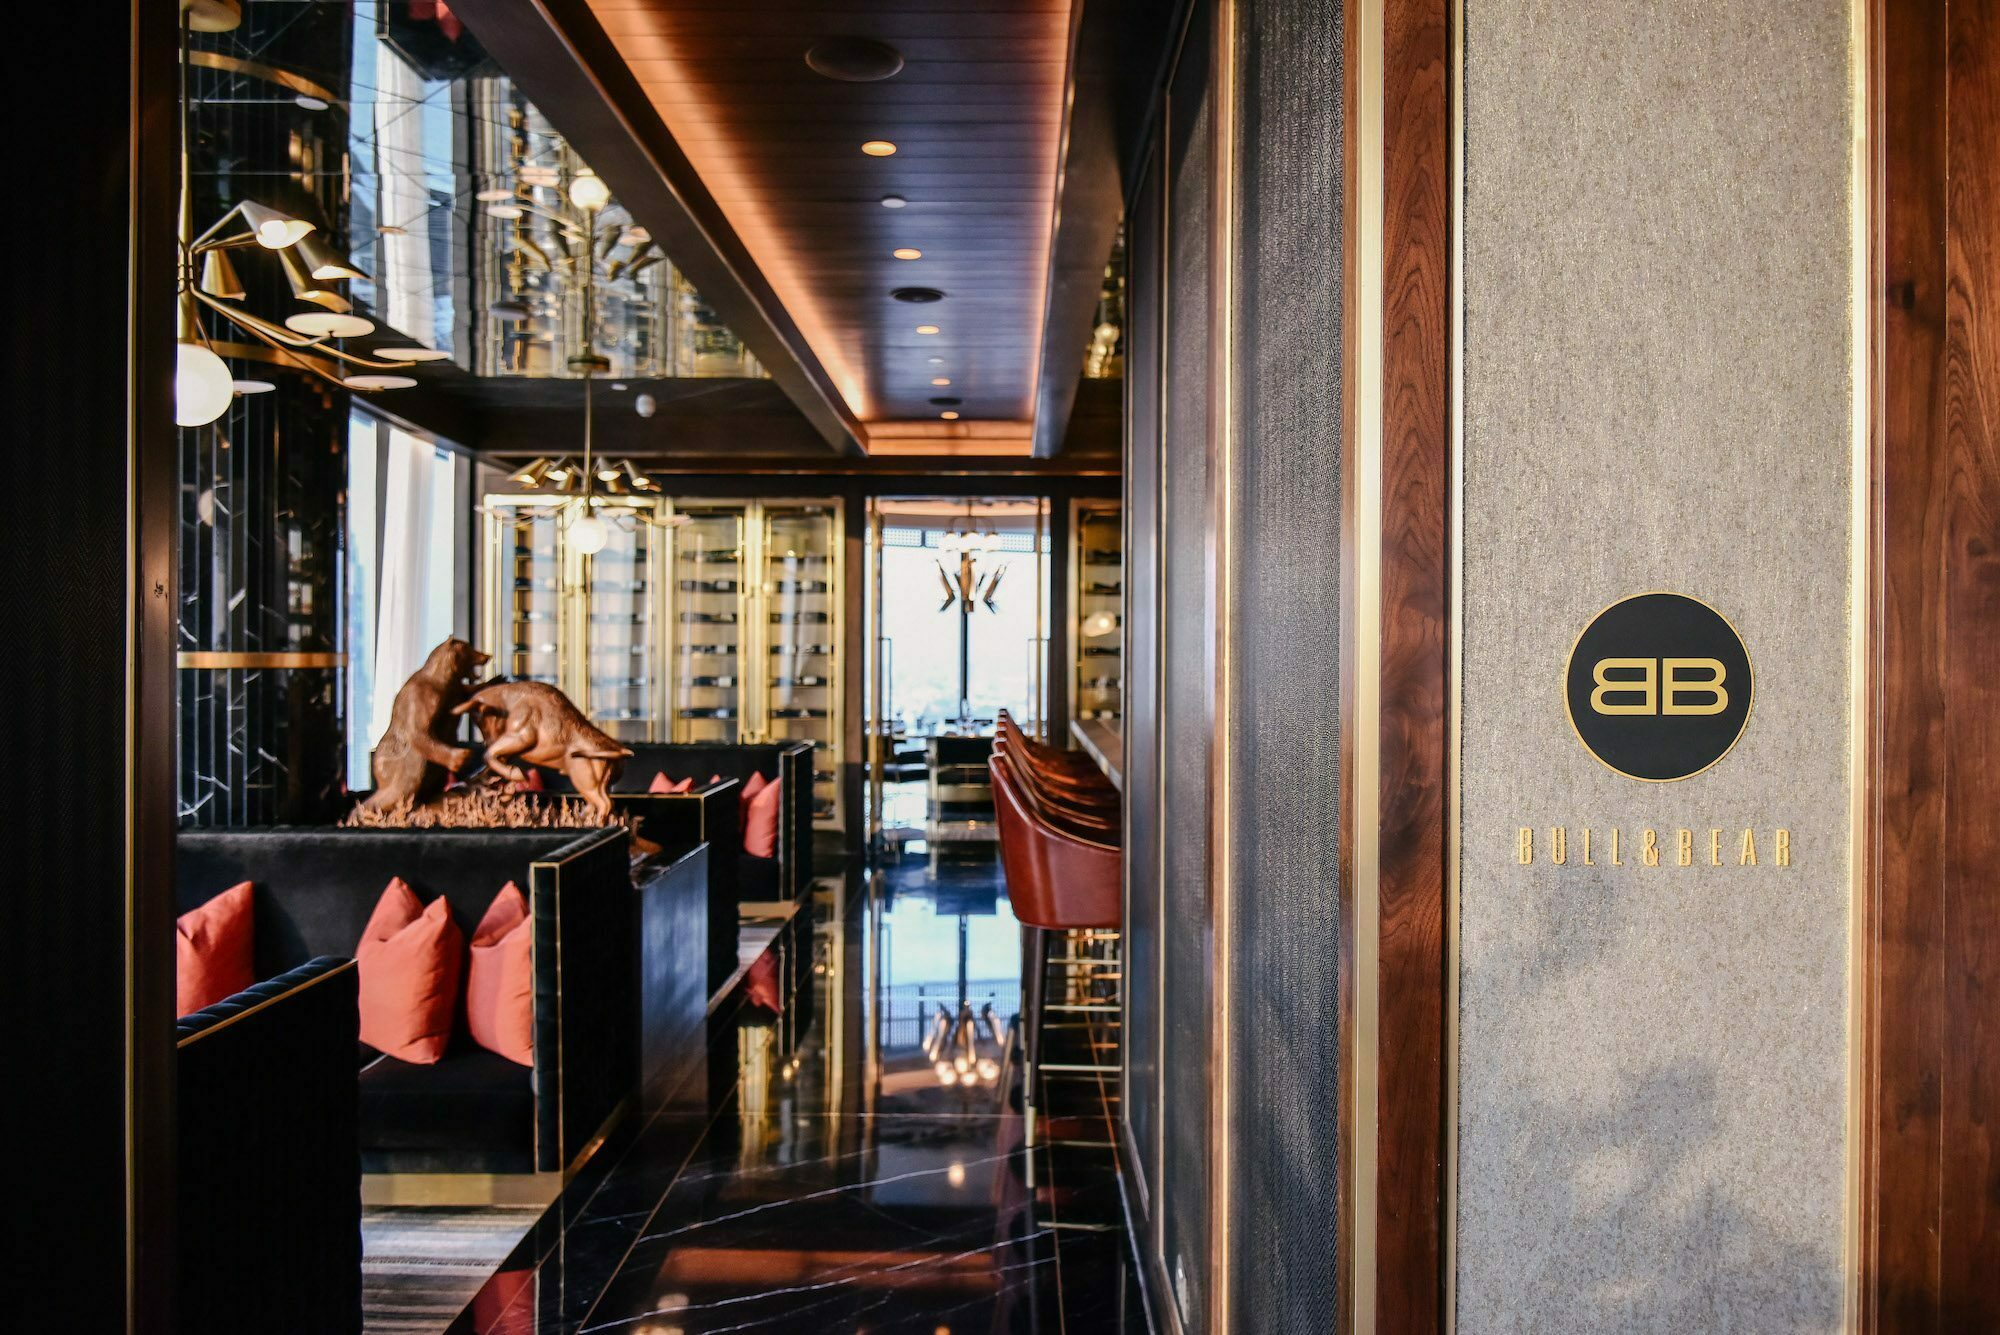 Bull & Bear steakhouse Bangkok, Waldorf Astoria